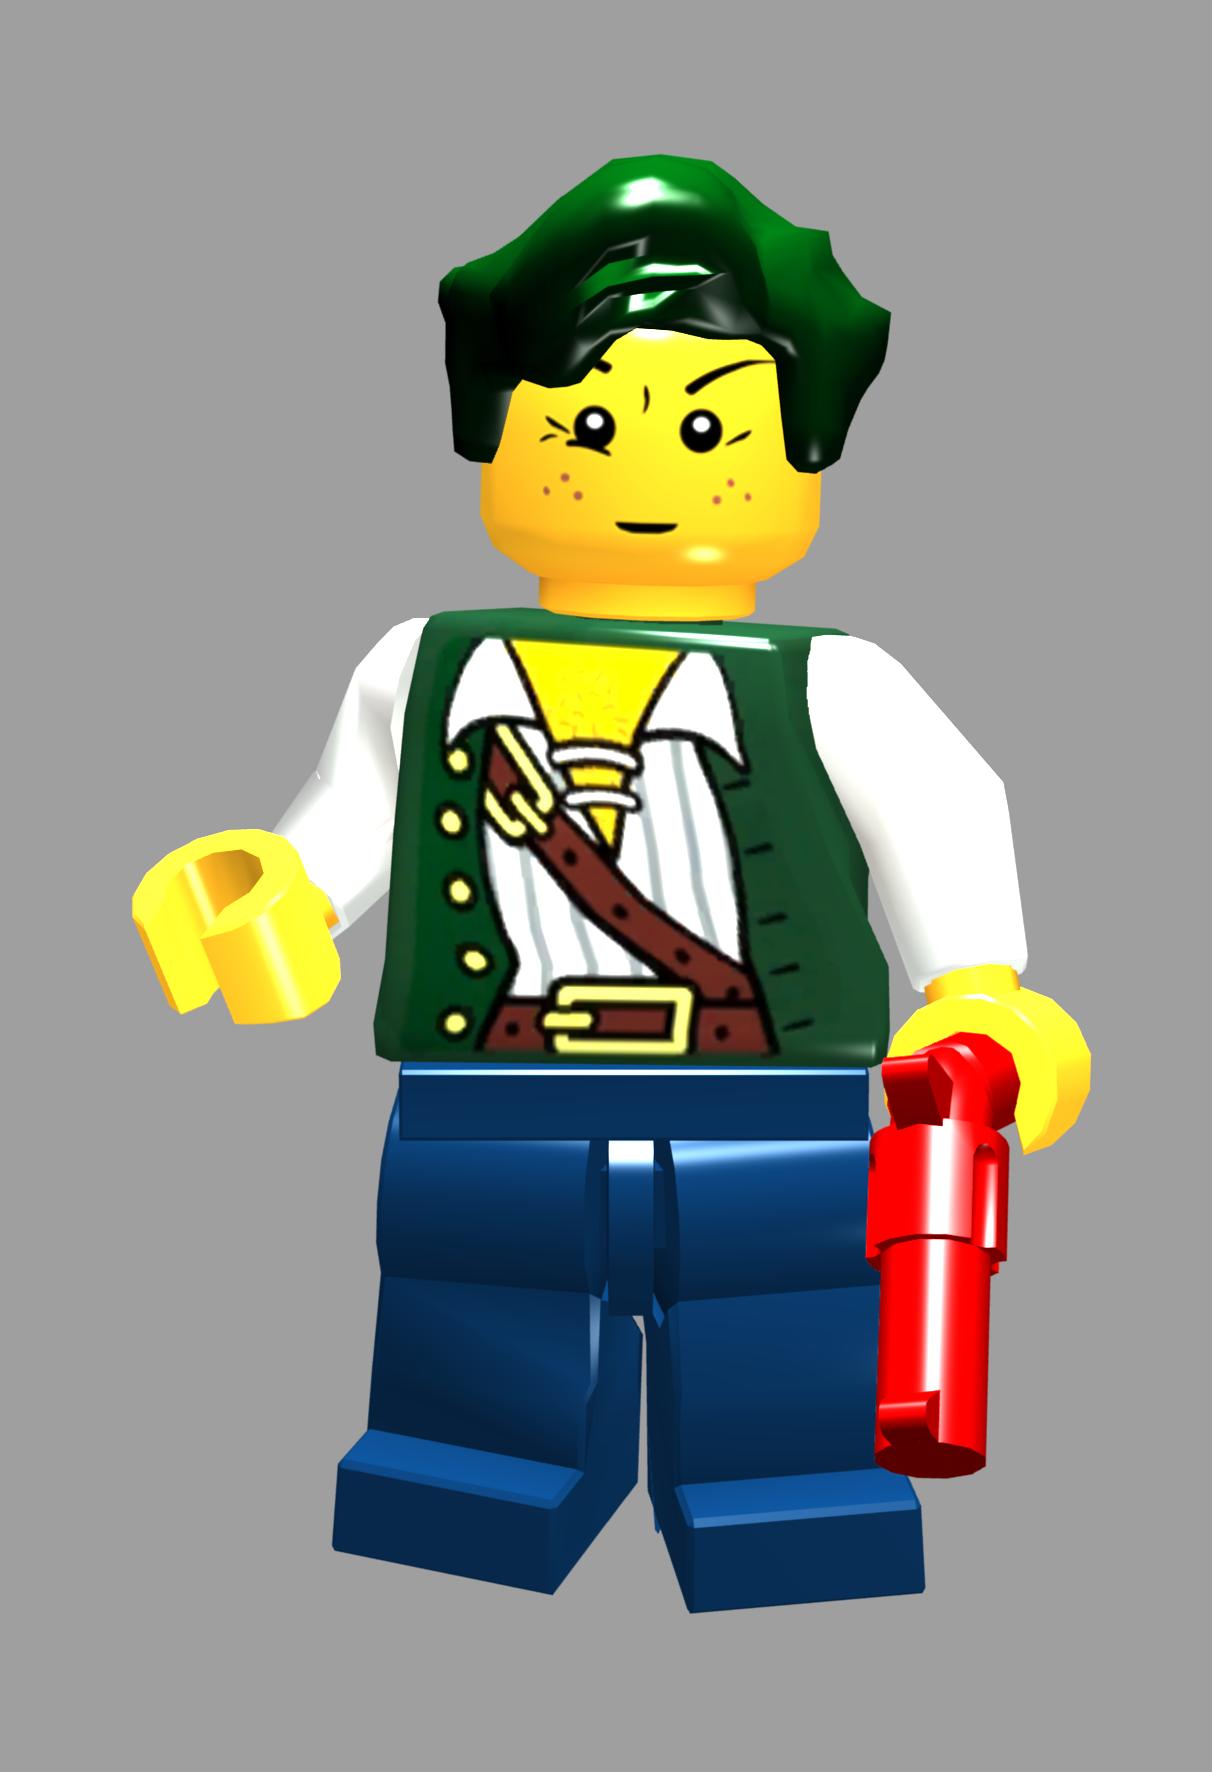 Legos clipart play. Image rioforce lego render